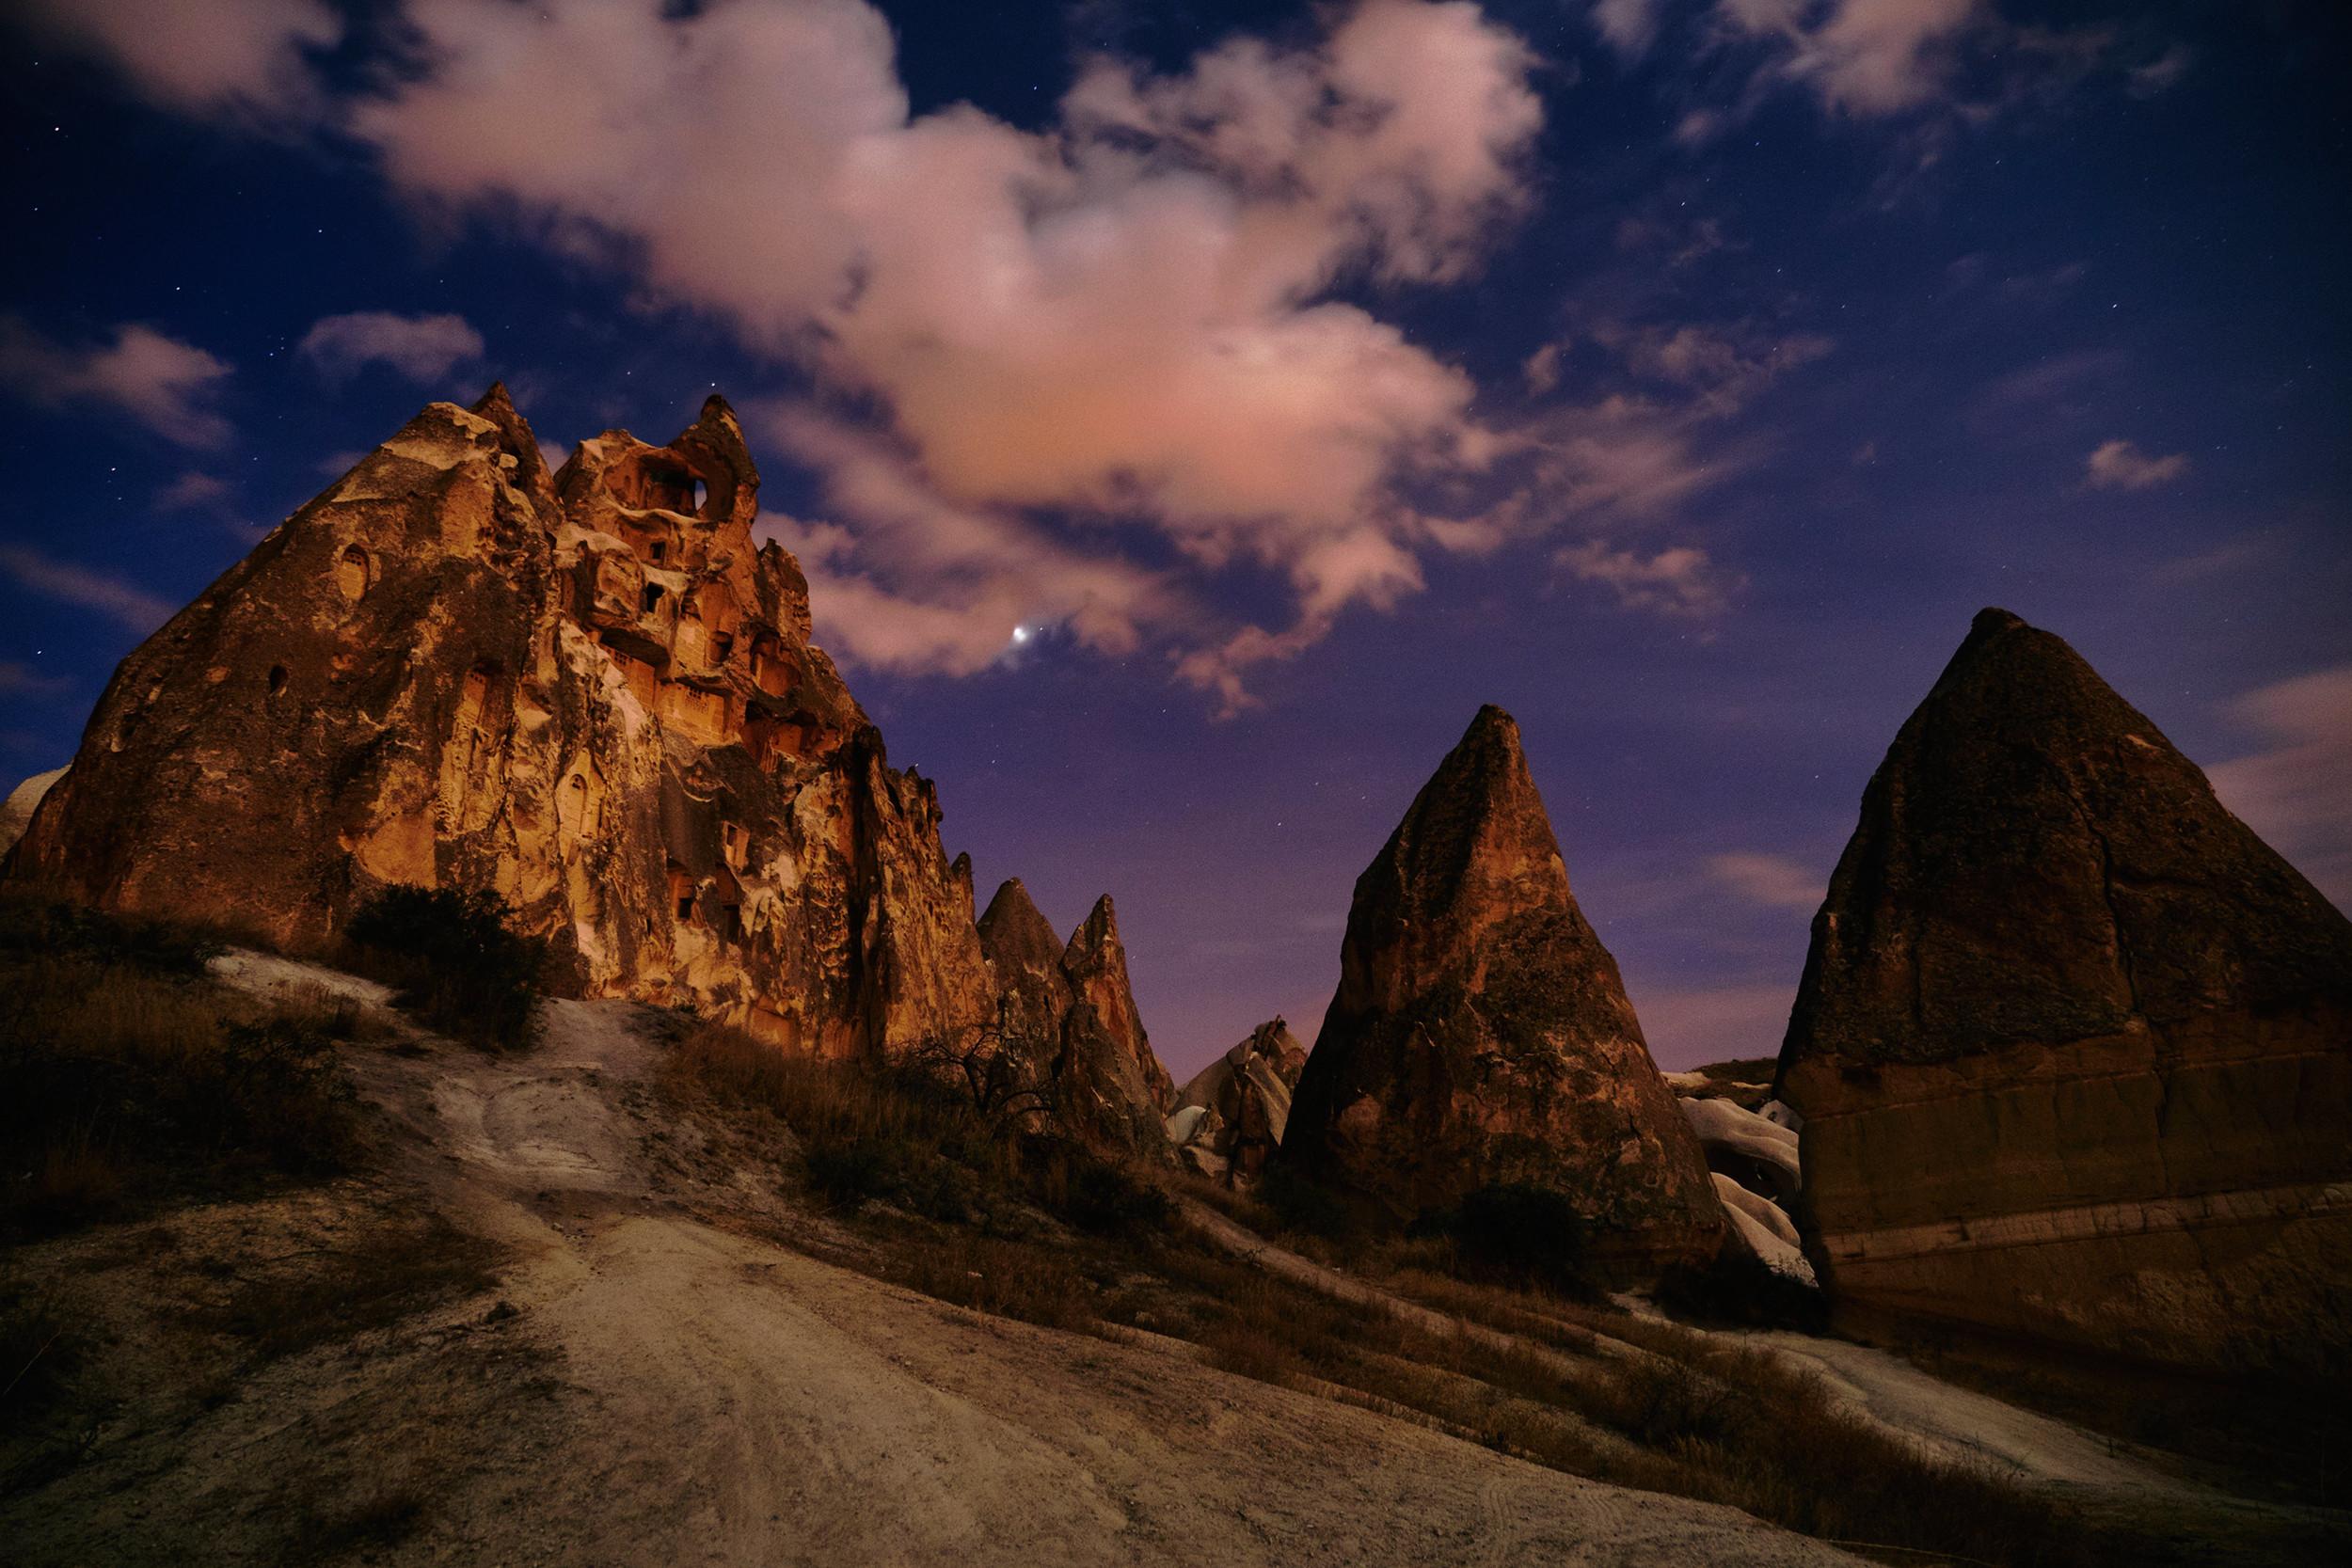 Cappadocia rock churches at night